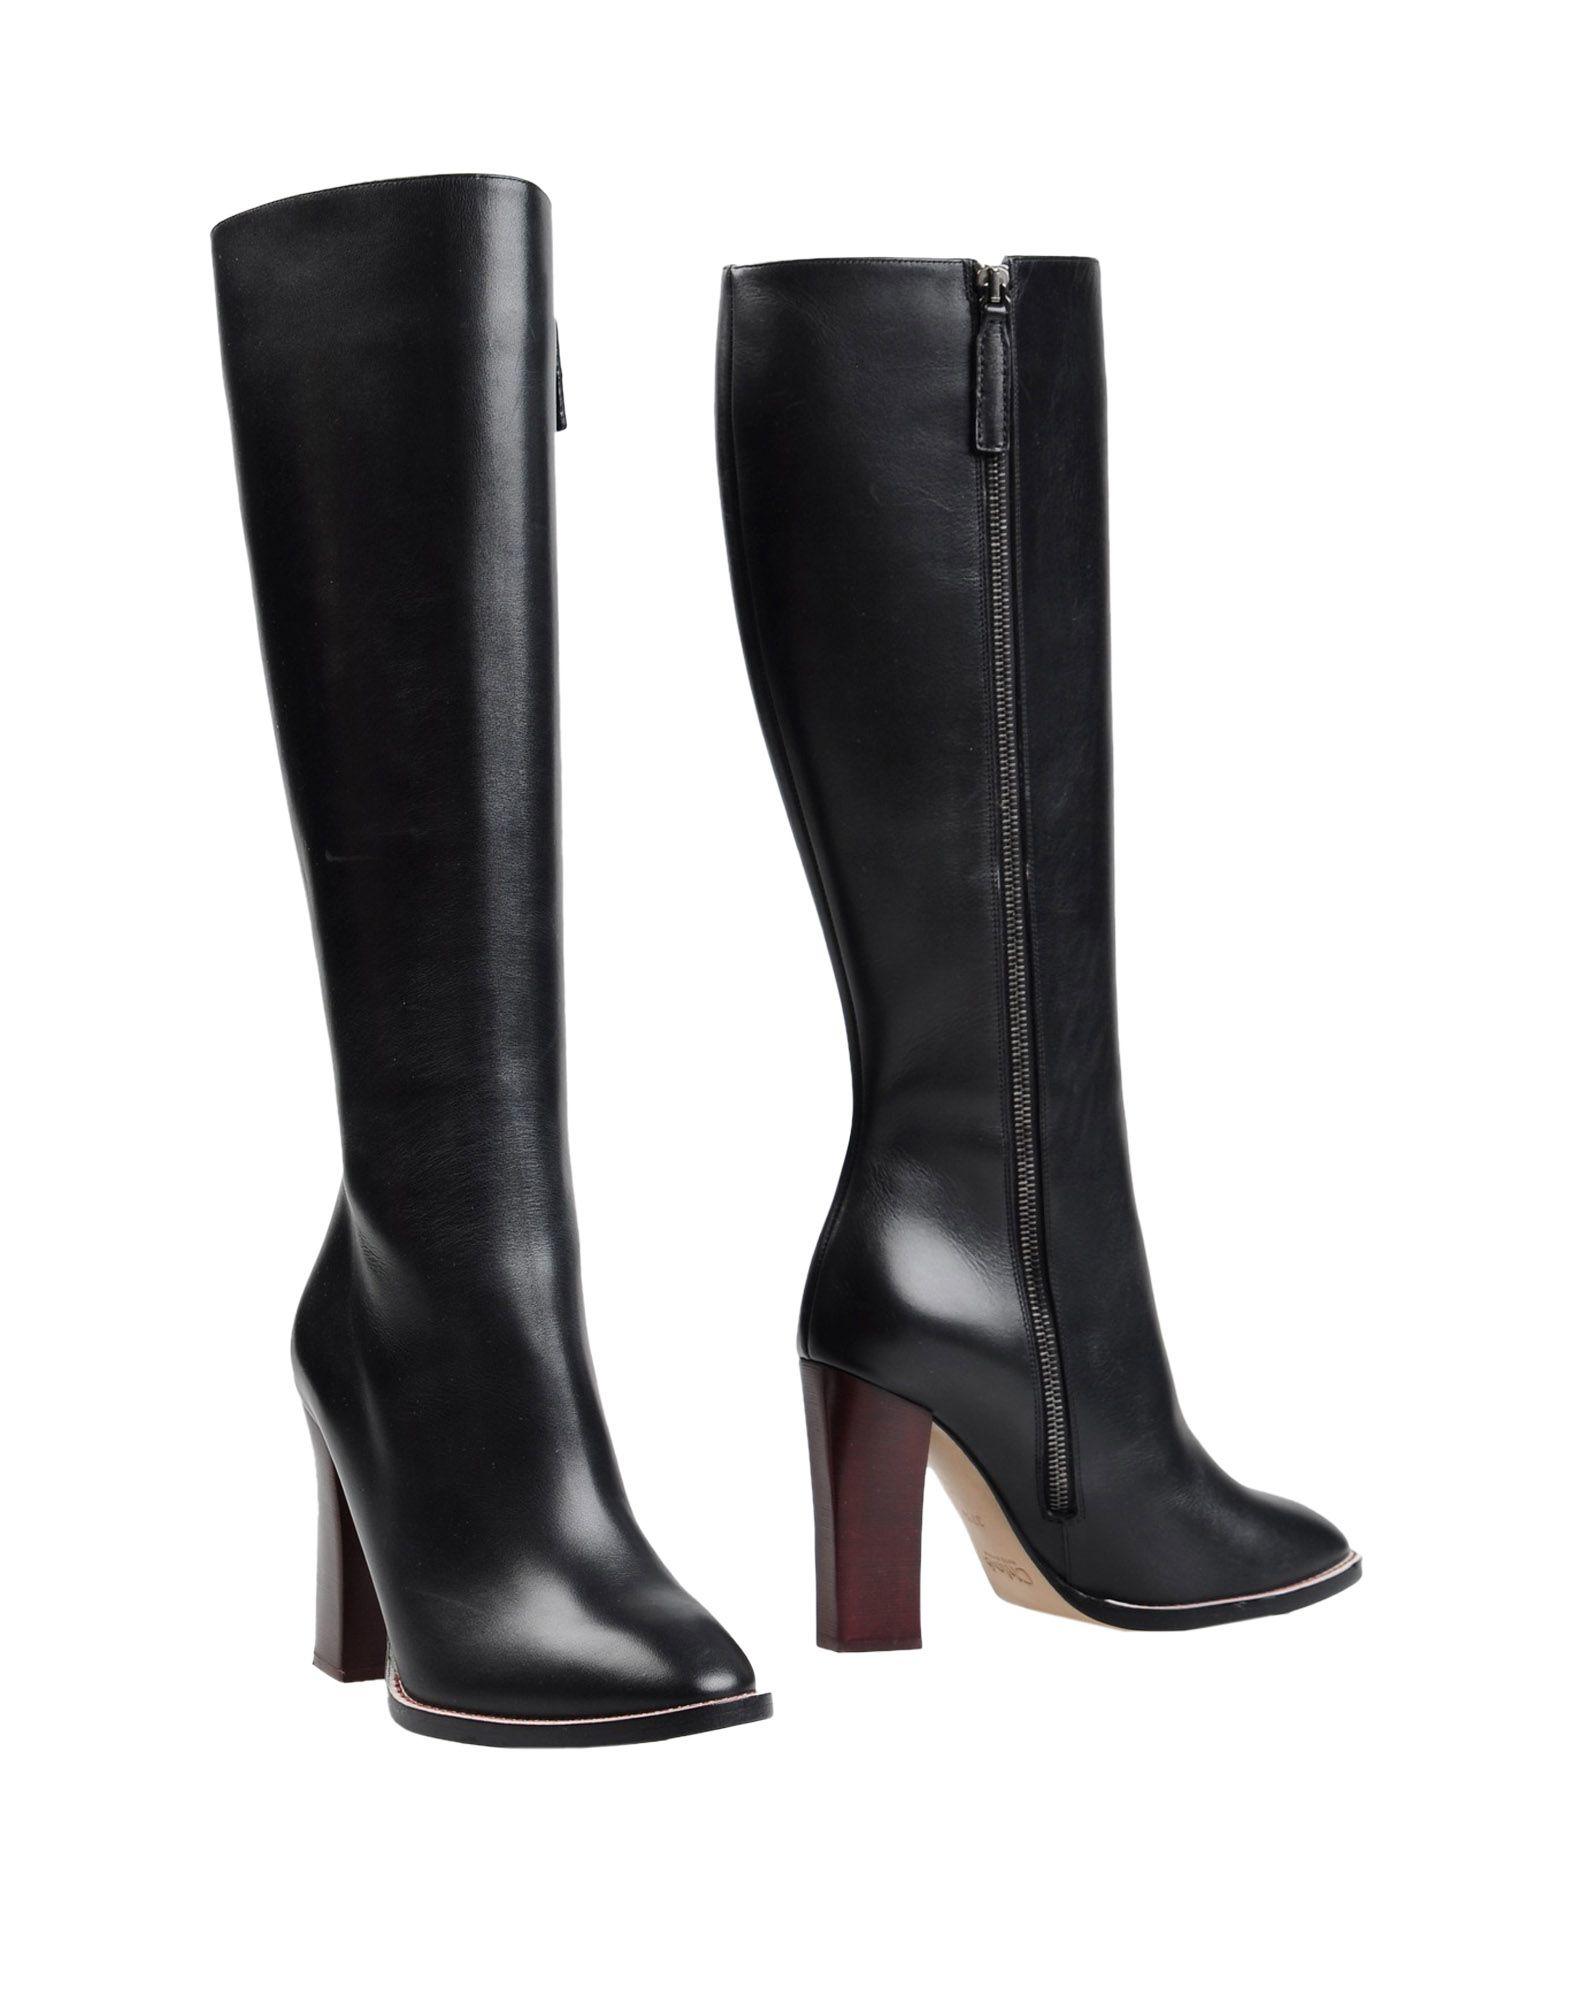 chlo boots in black lyst. Black Bedroom Furniture Sets. Home Design Ideas